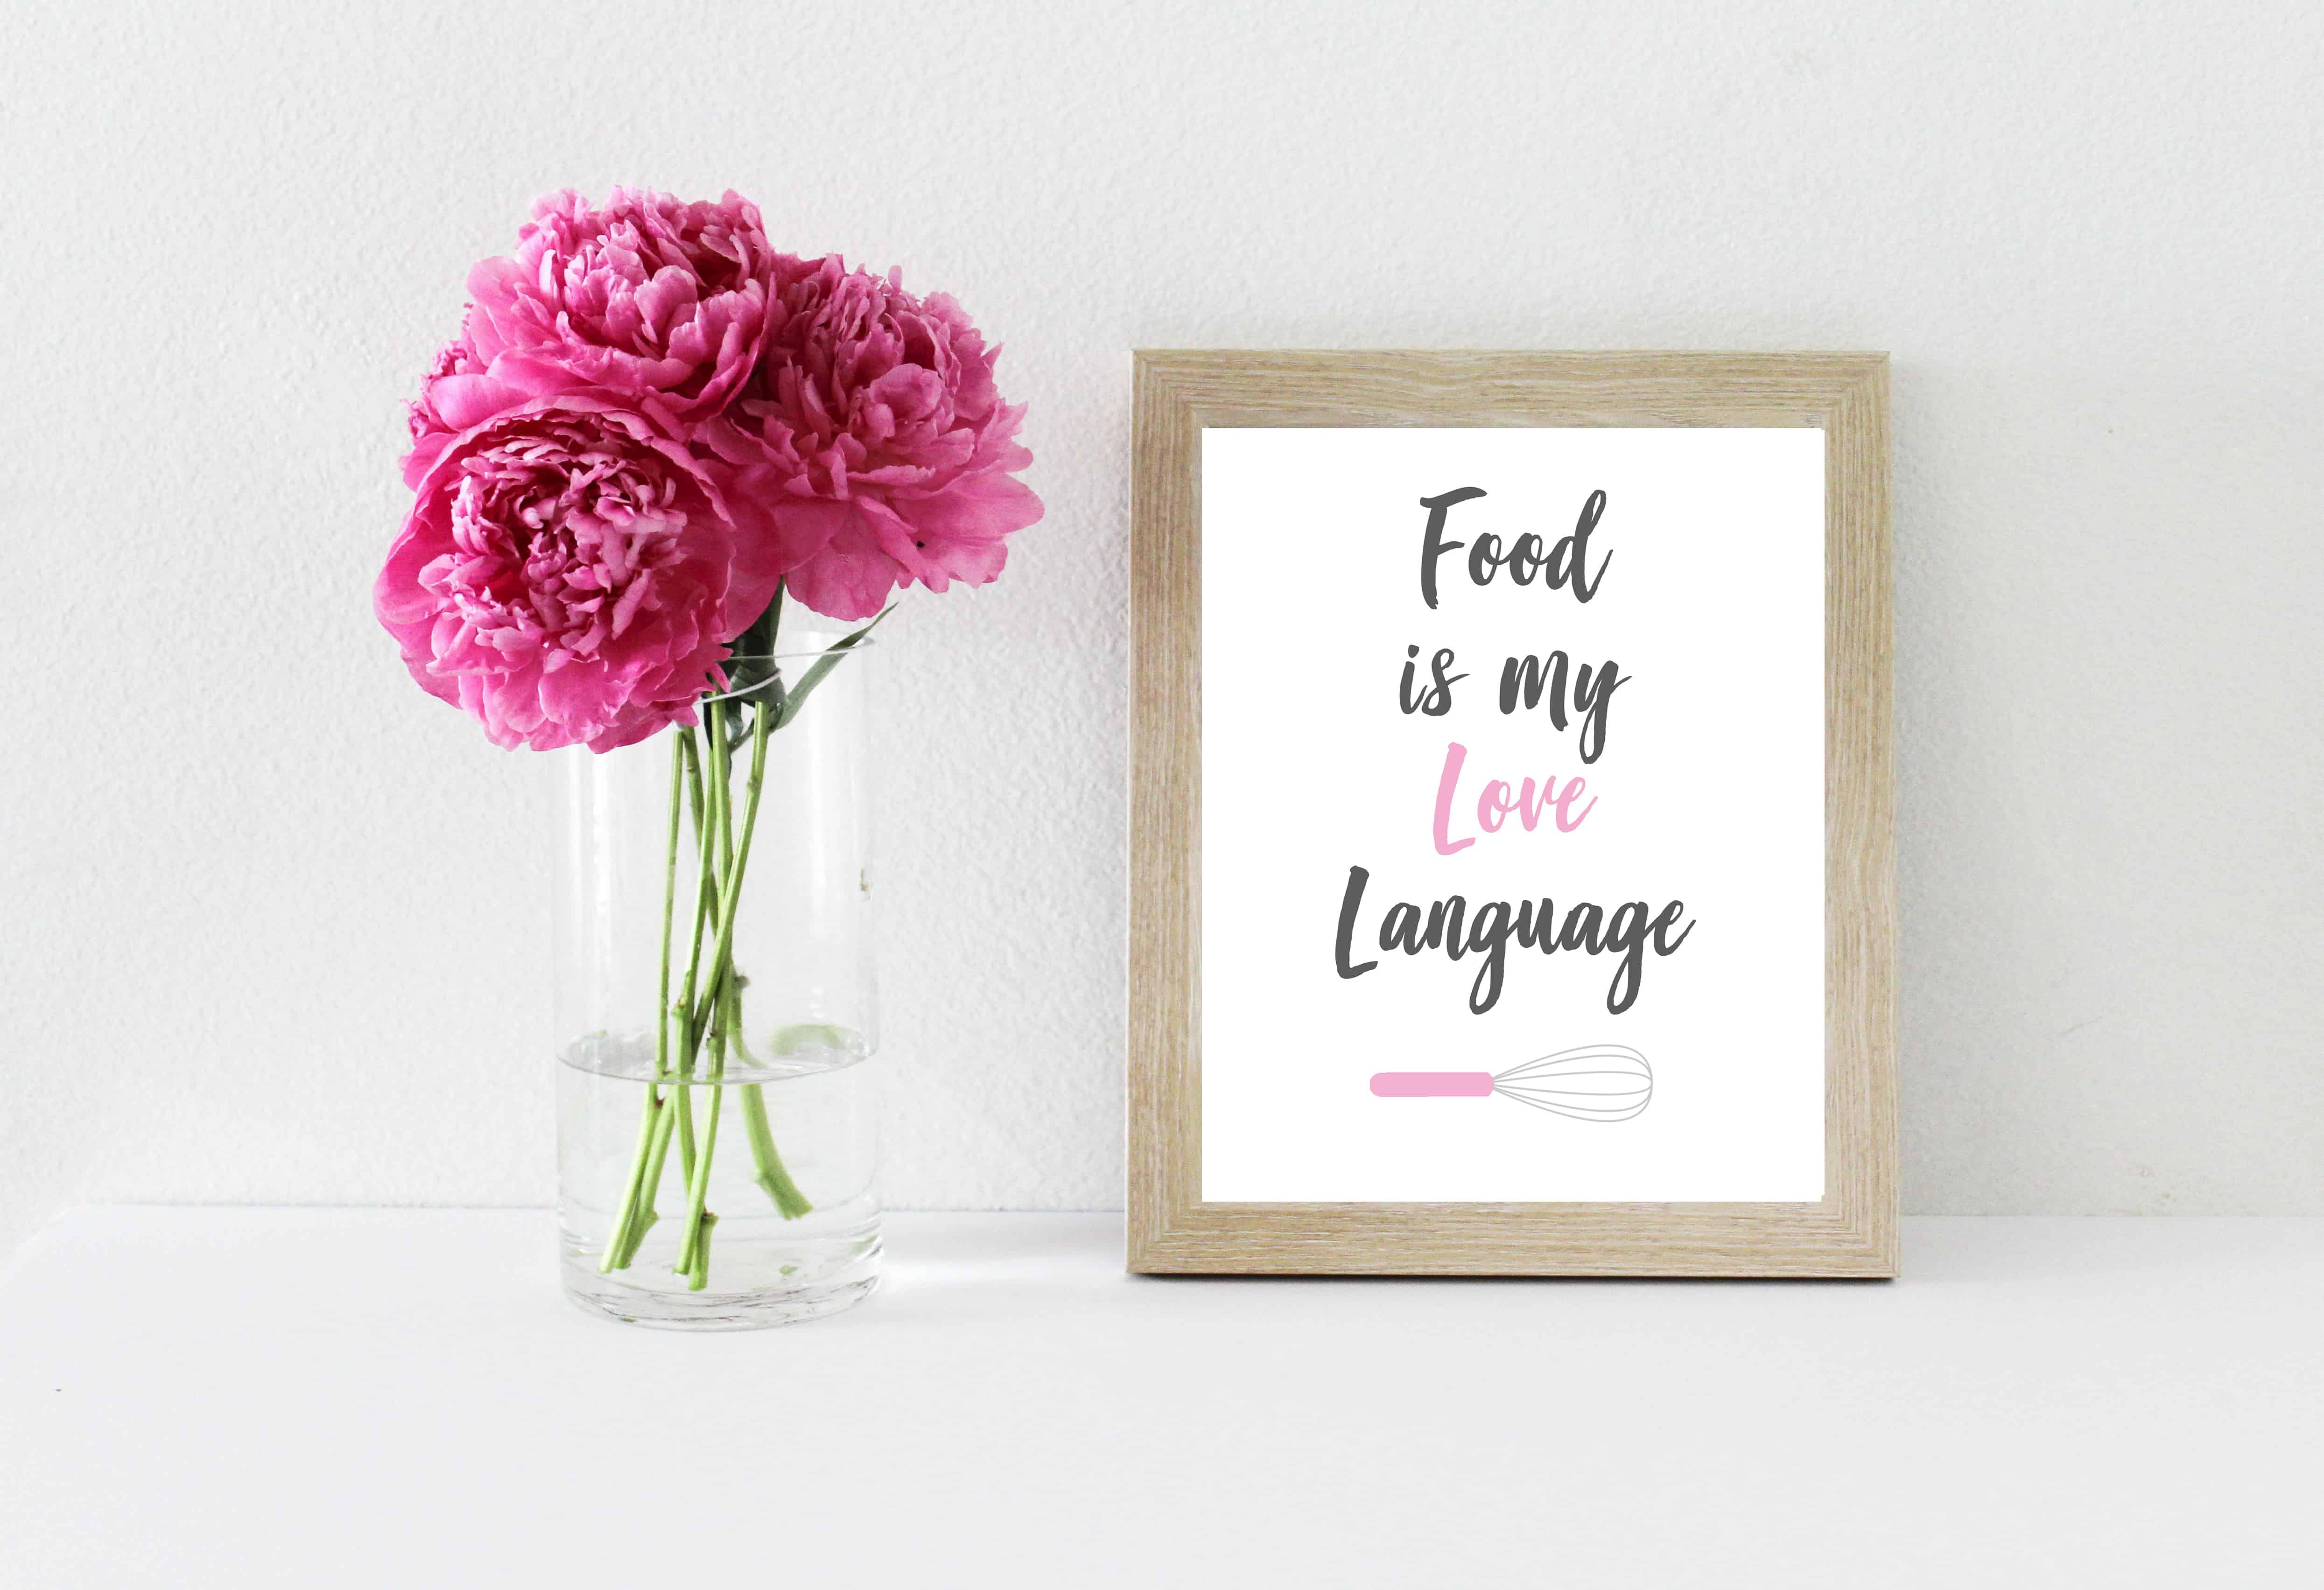 my love language